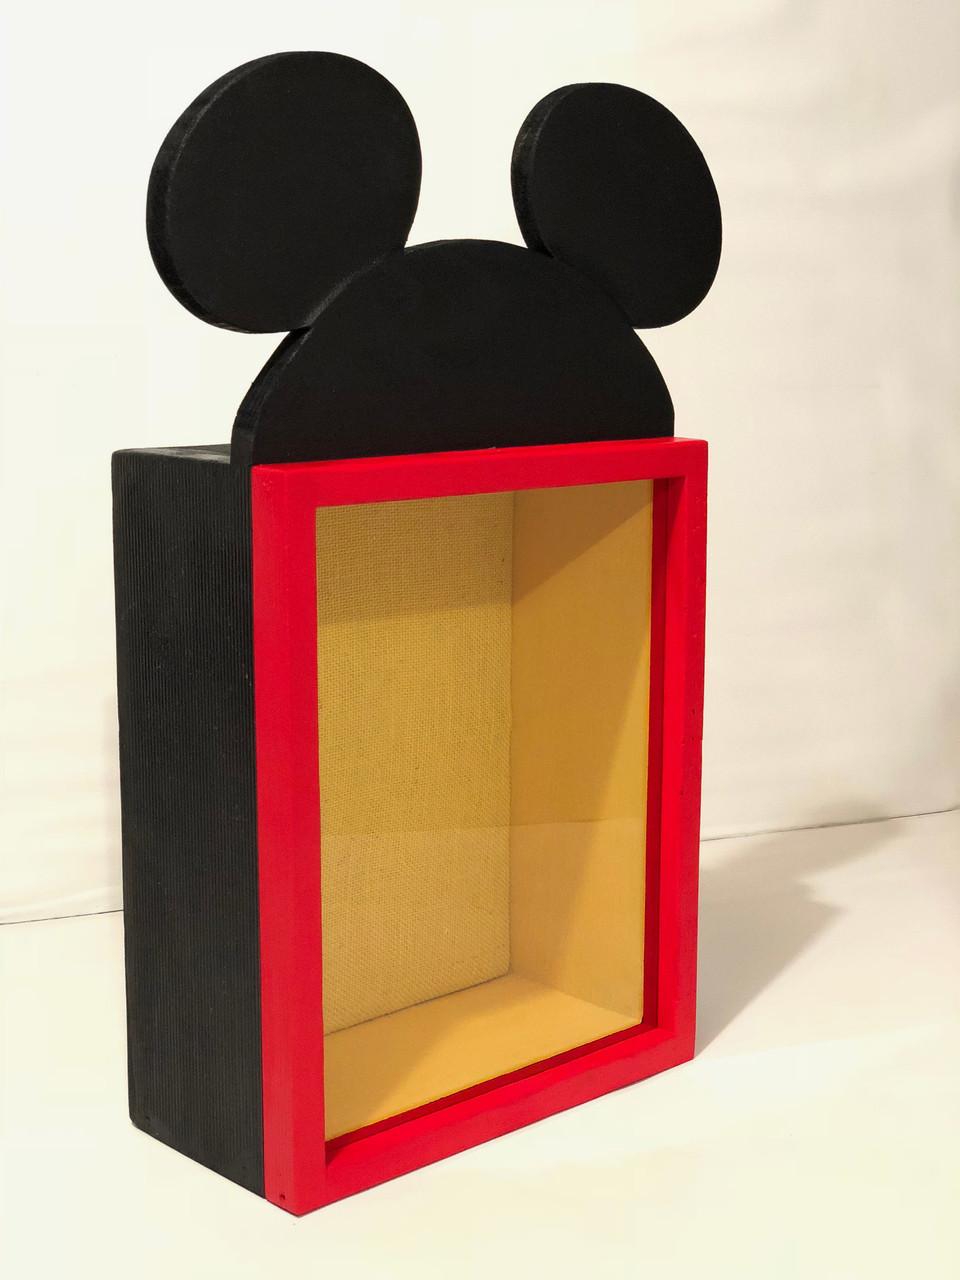 Disney Inspired Inspired Shadow Box | The Farm Mechanic